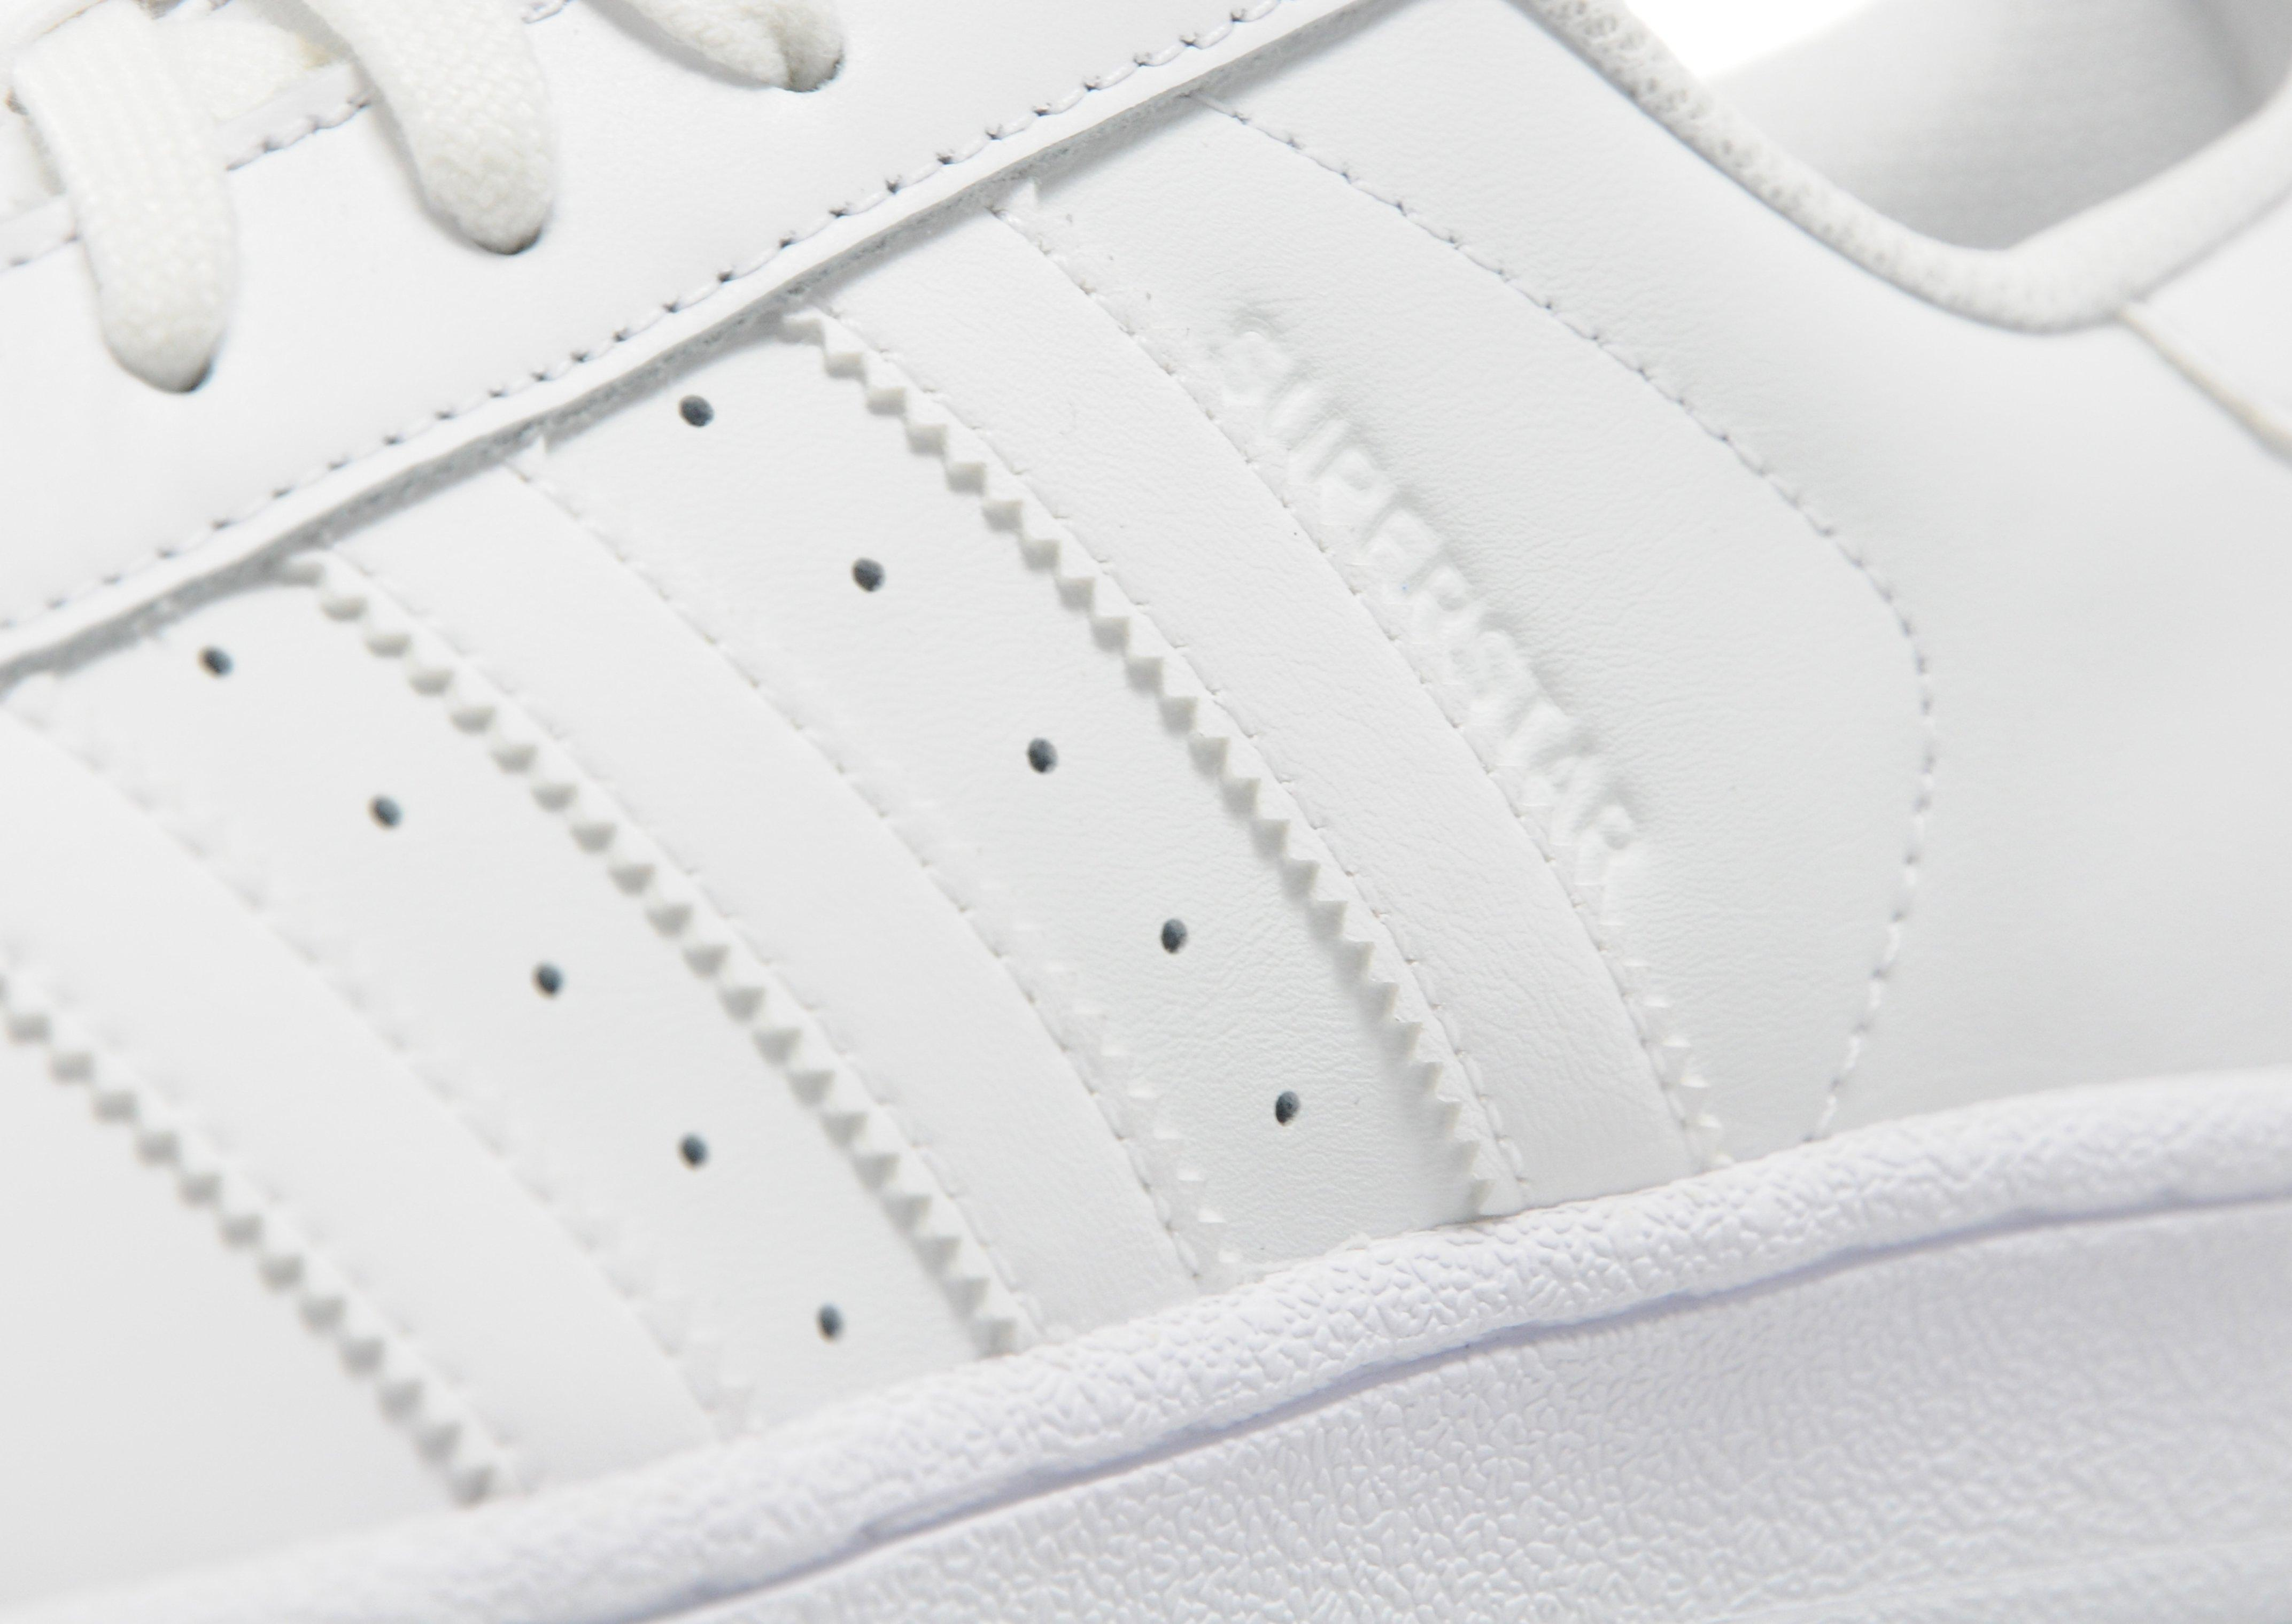 Adidas Superstar Silver Glitter Stripes ballinteerbandb.co.uk 0d5b5d0ec